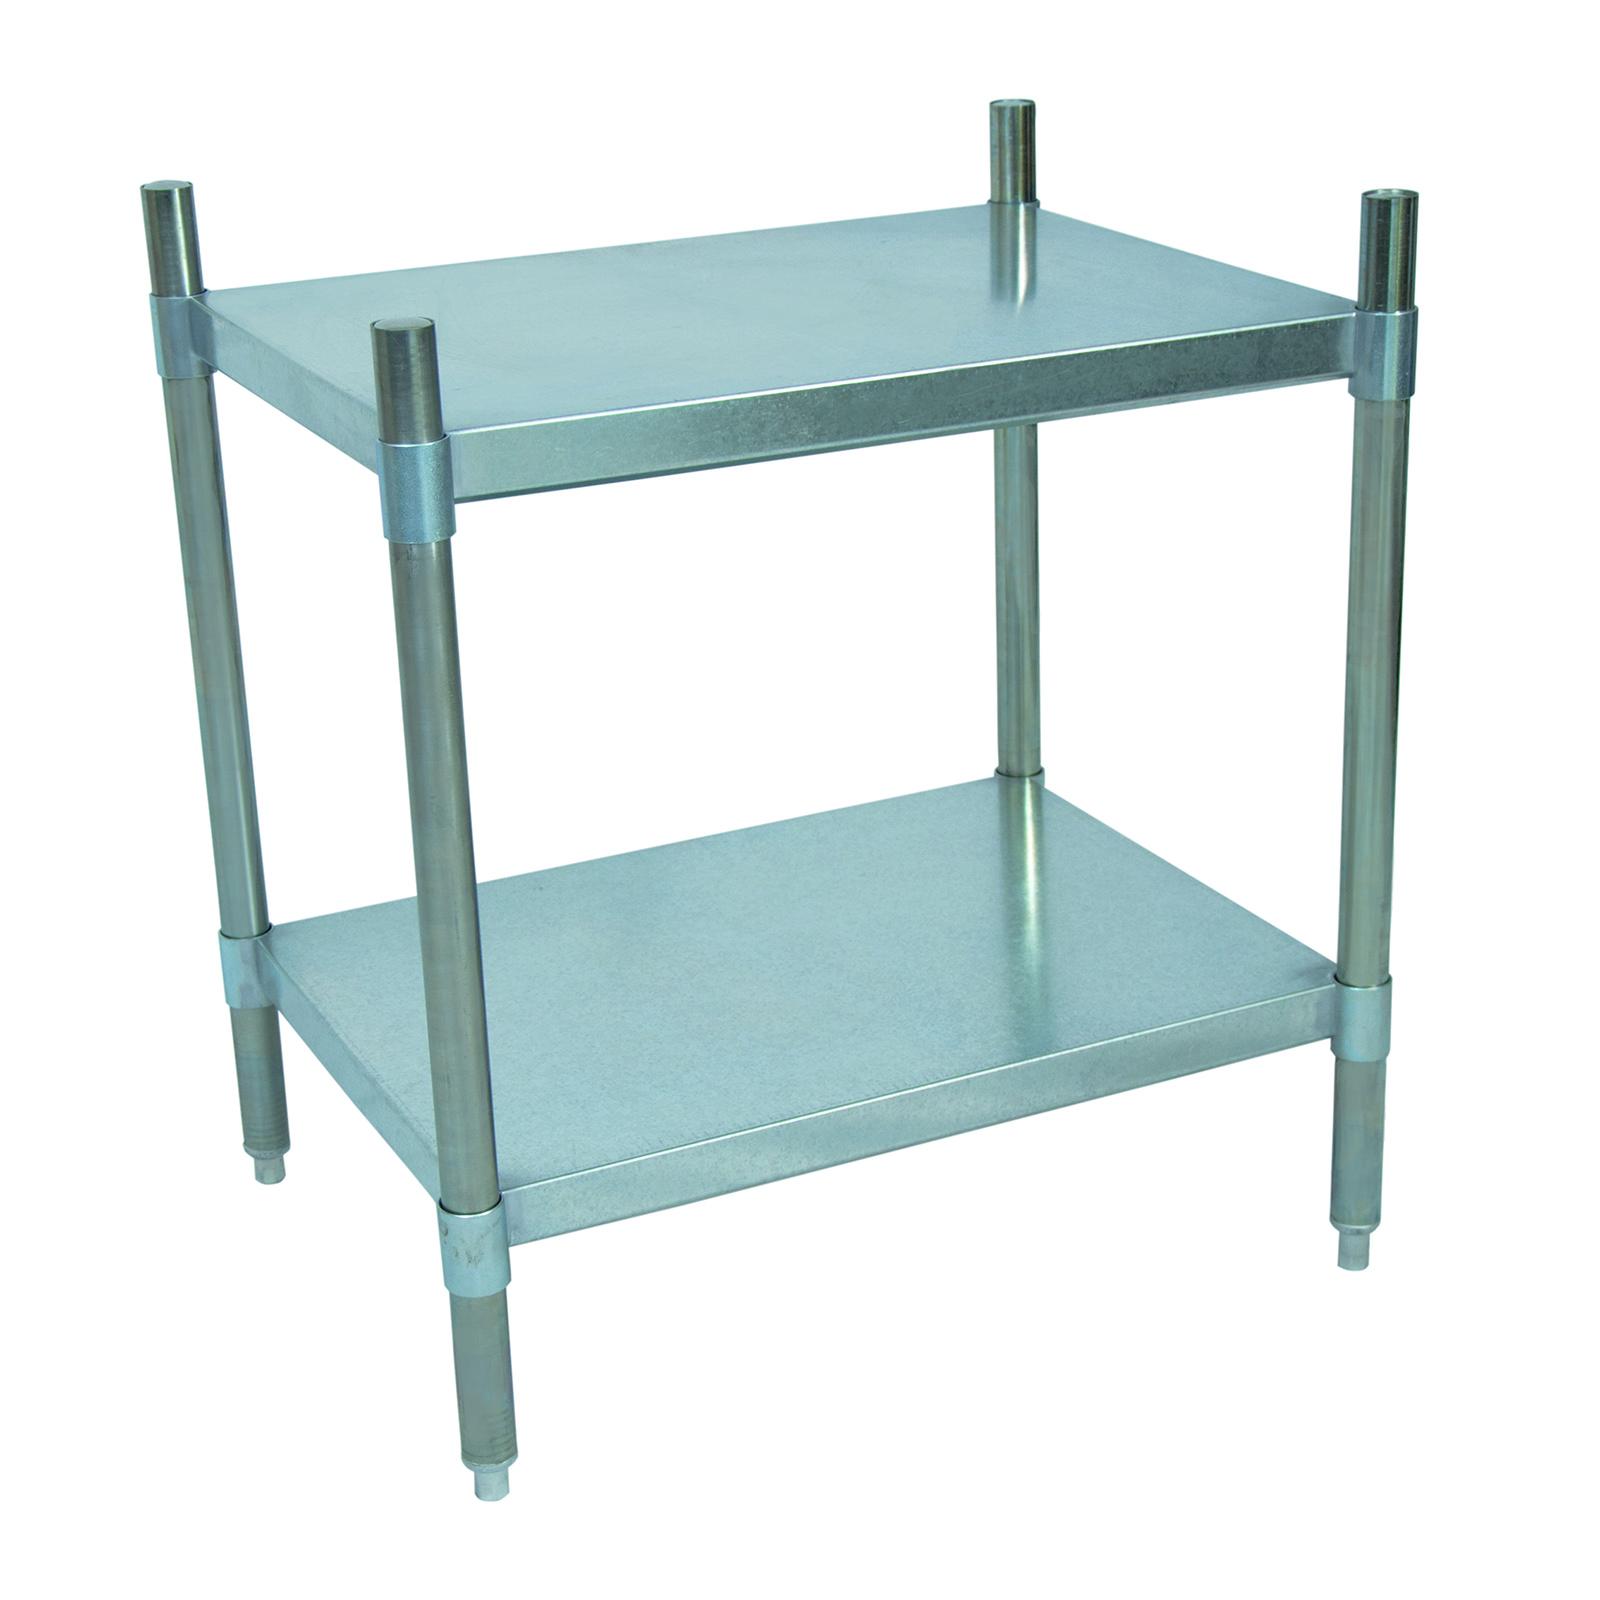 BK Resources VSU3-6724 shelving unit, solid flat